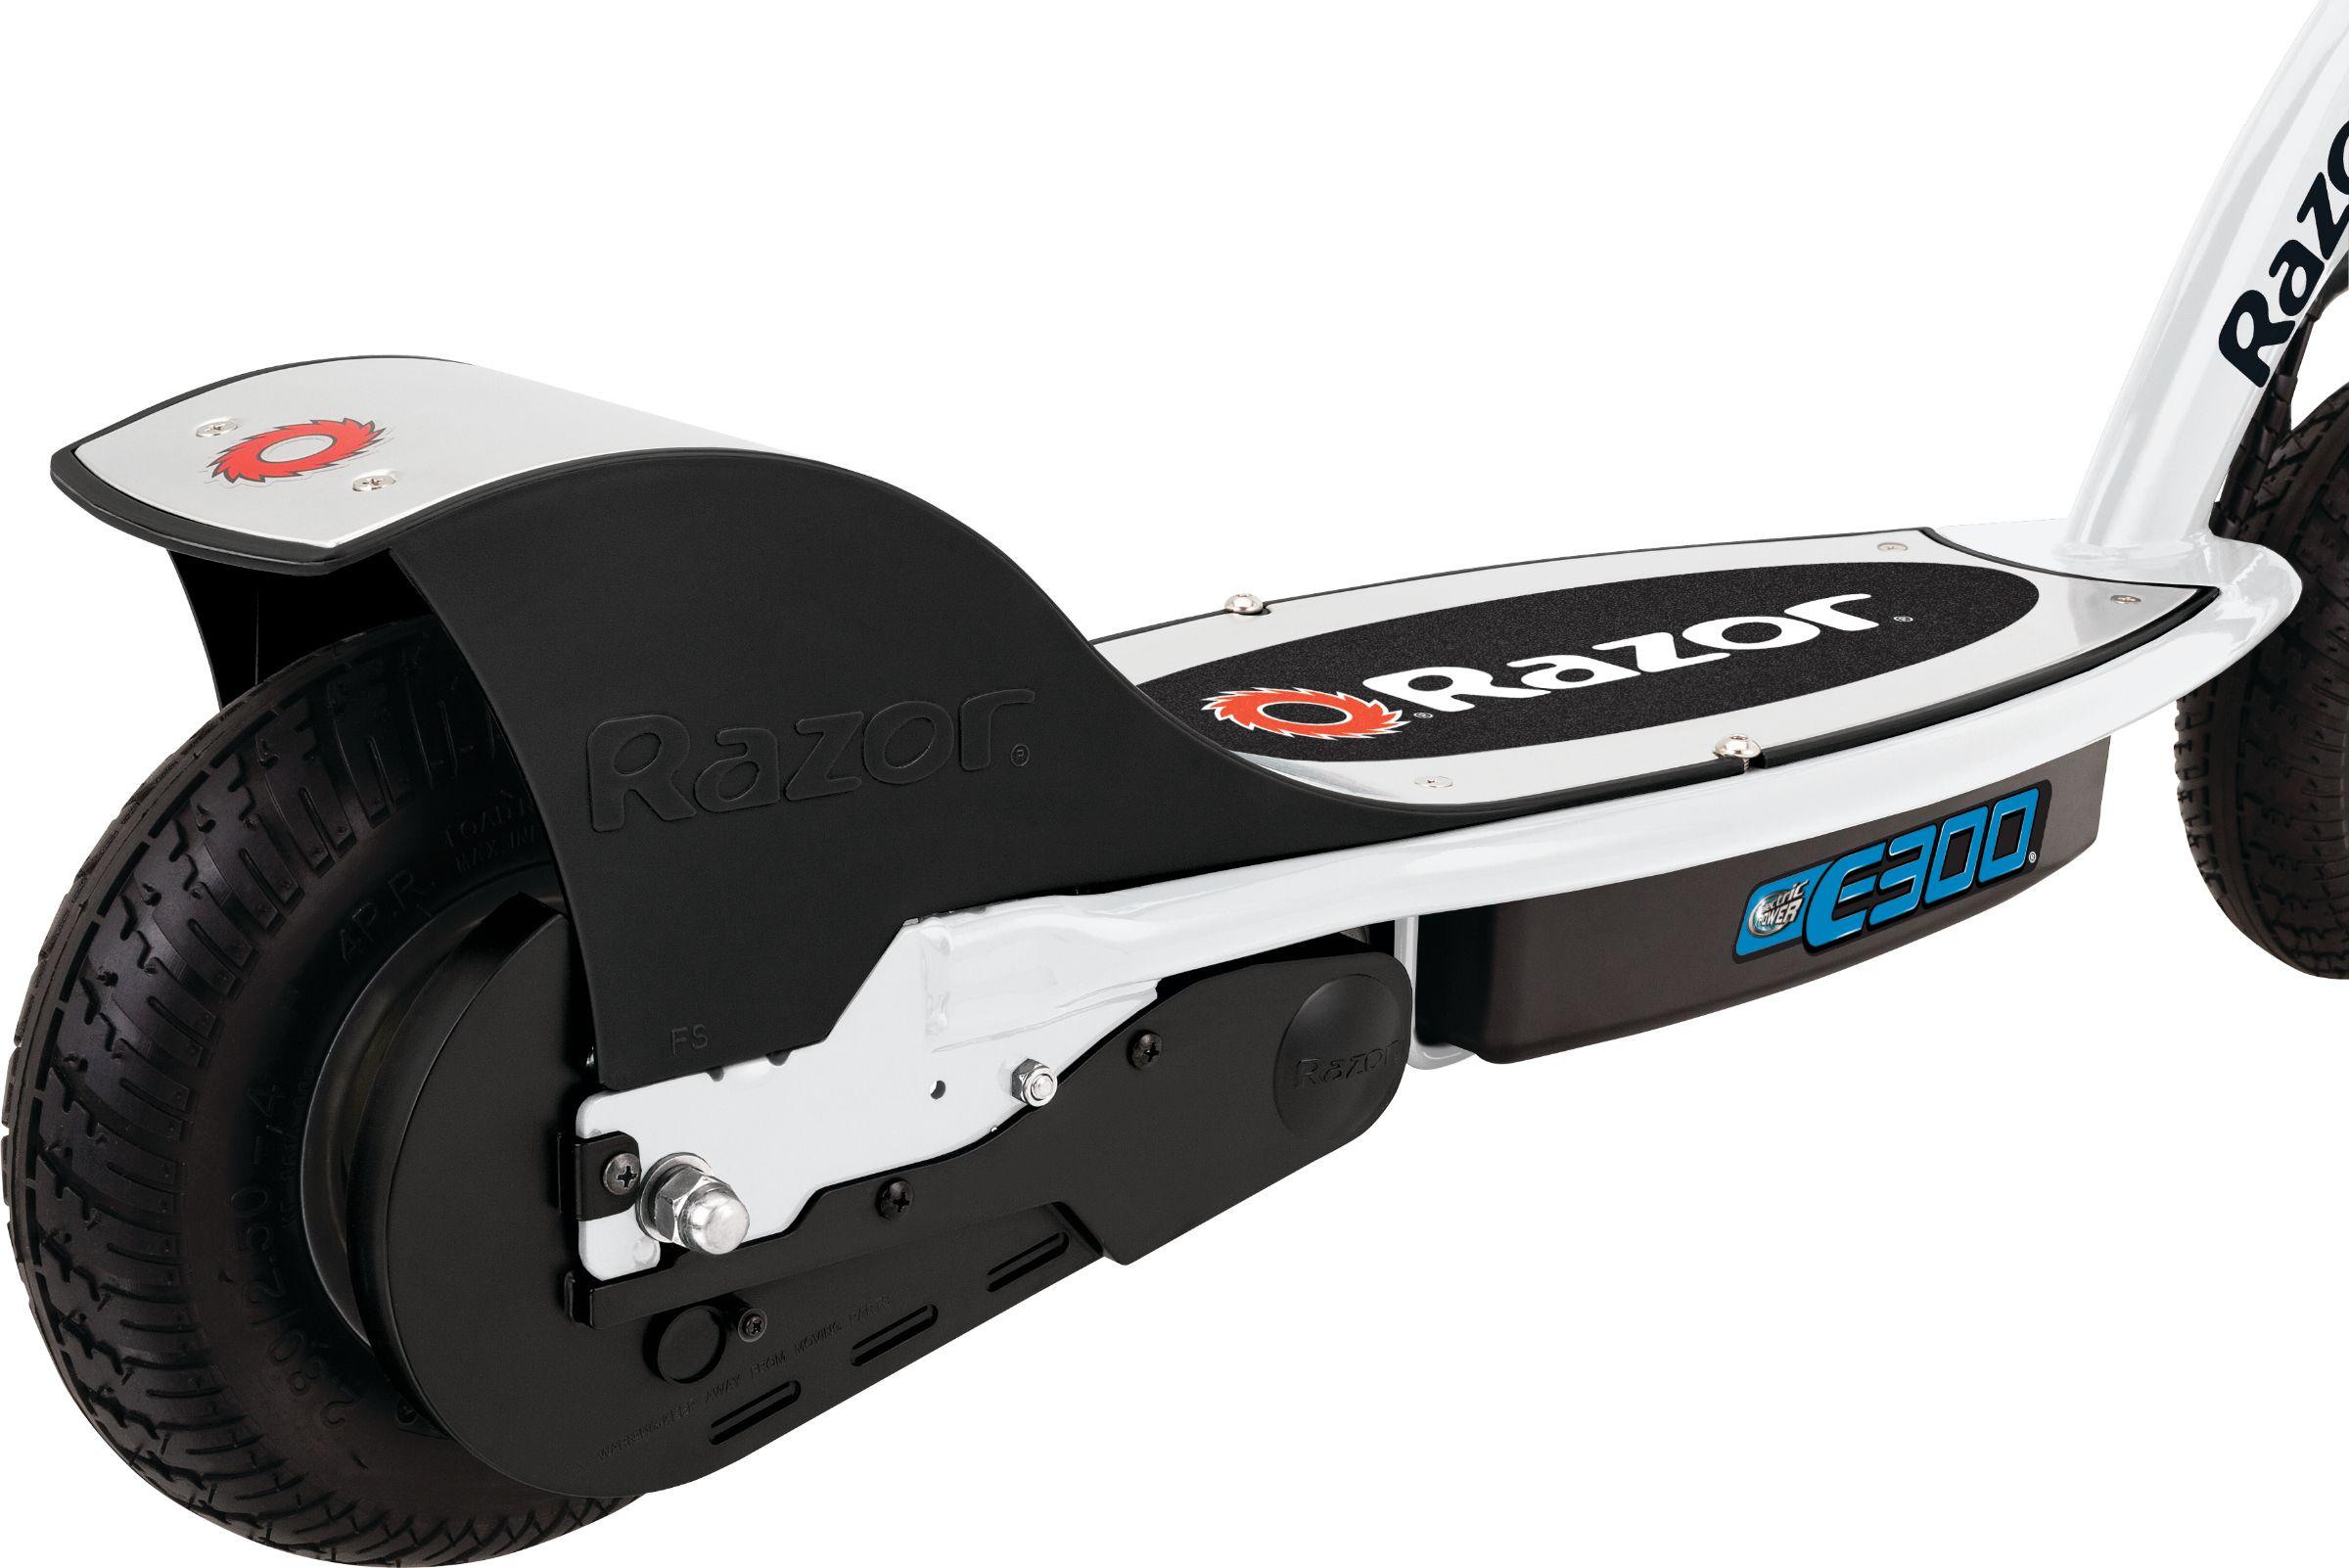 Razor electric scooter e300 toys r us